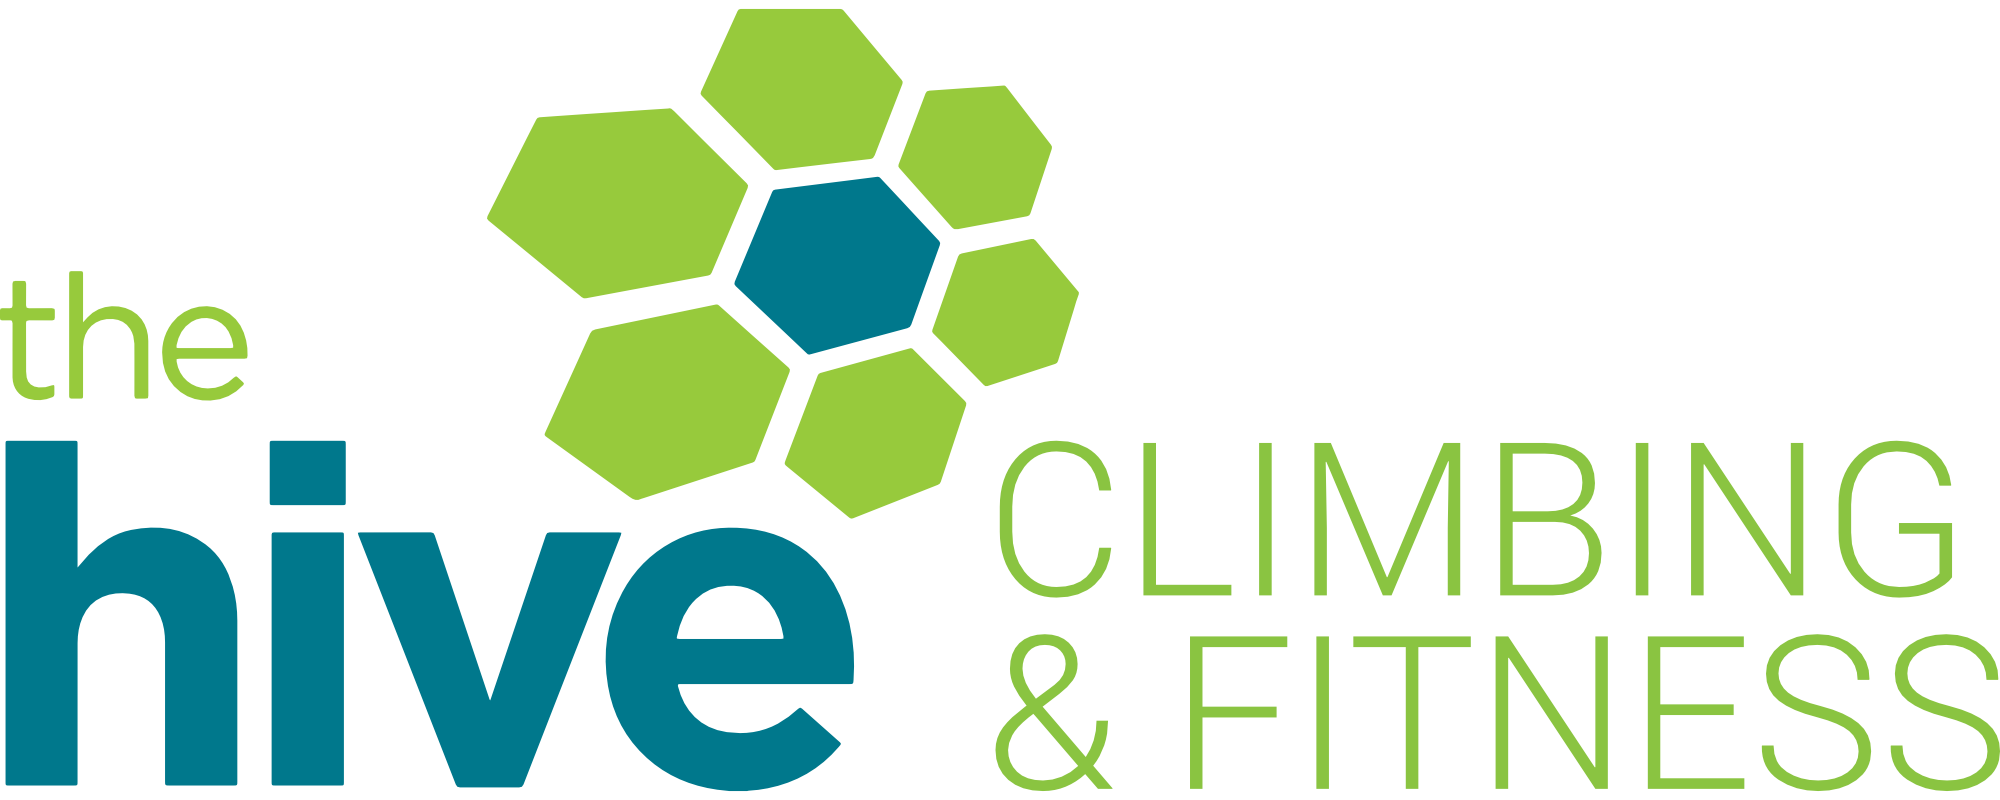 The Hive Climbing & Fitness - Logo